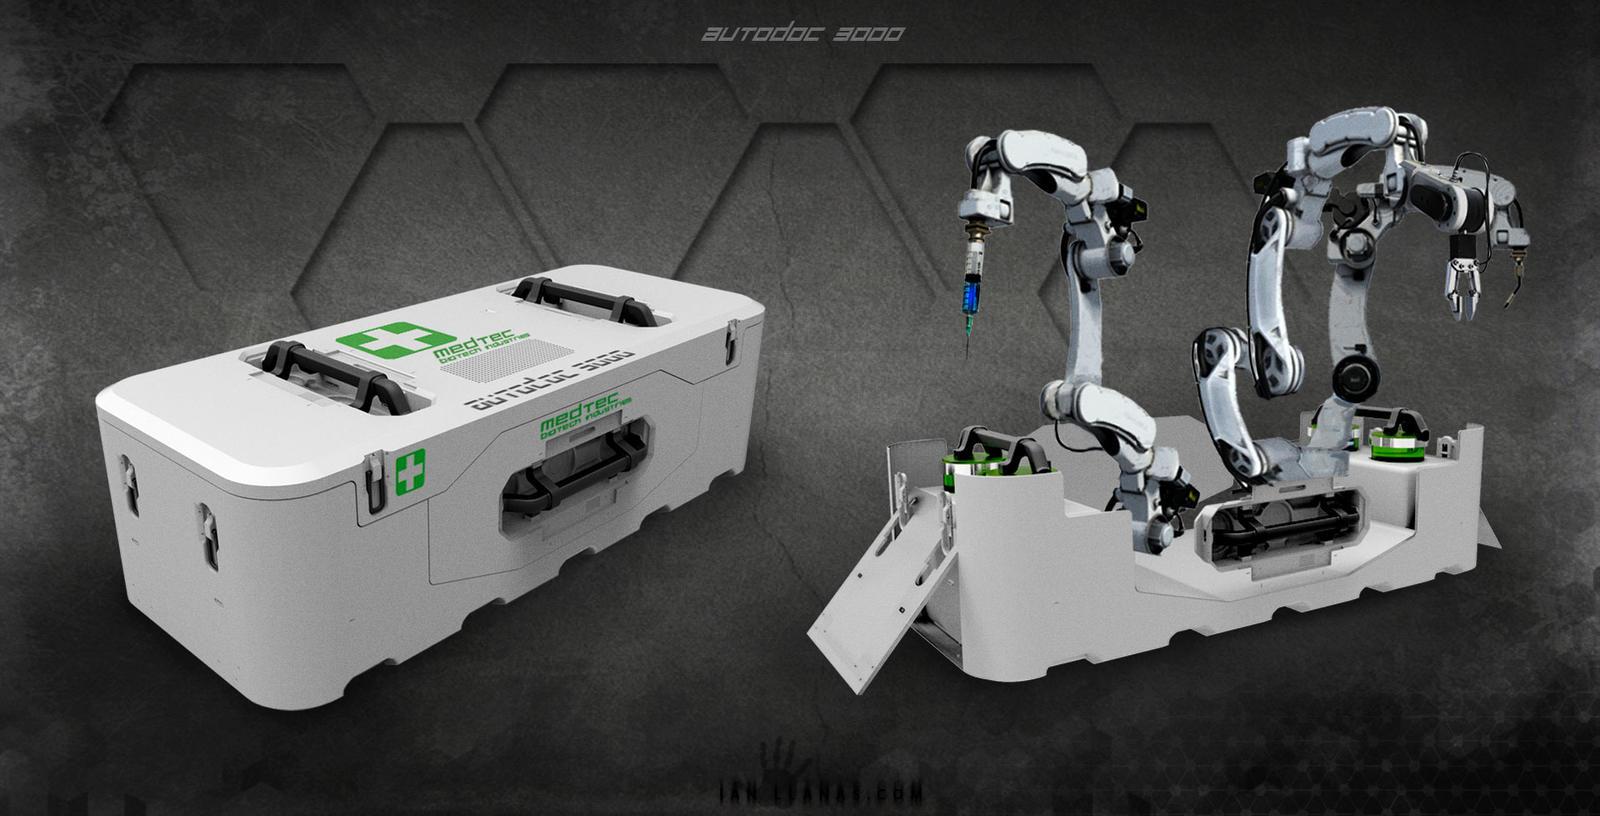 autodoc 3000 by ianllanas on deviantart. Black Bedroom Furniture Sets. Home Design Ideas